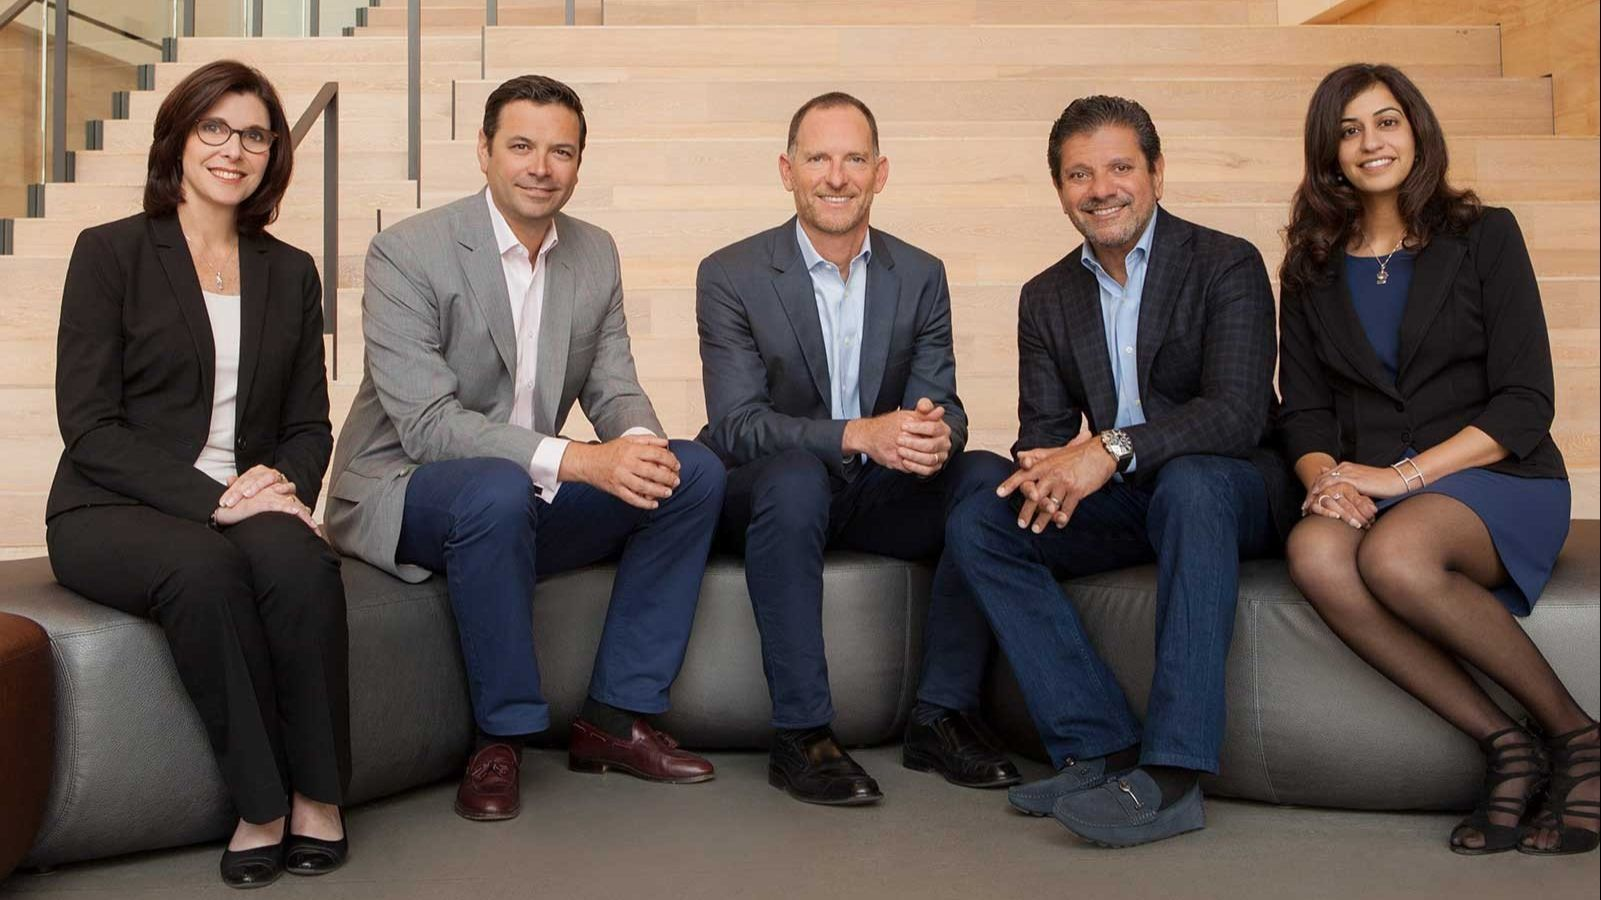 San Diego survives nationwide IPO slump